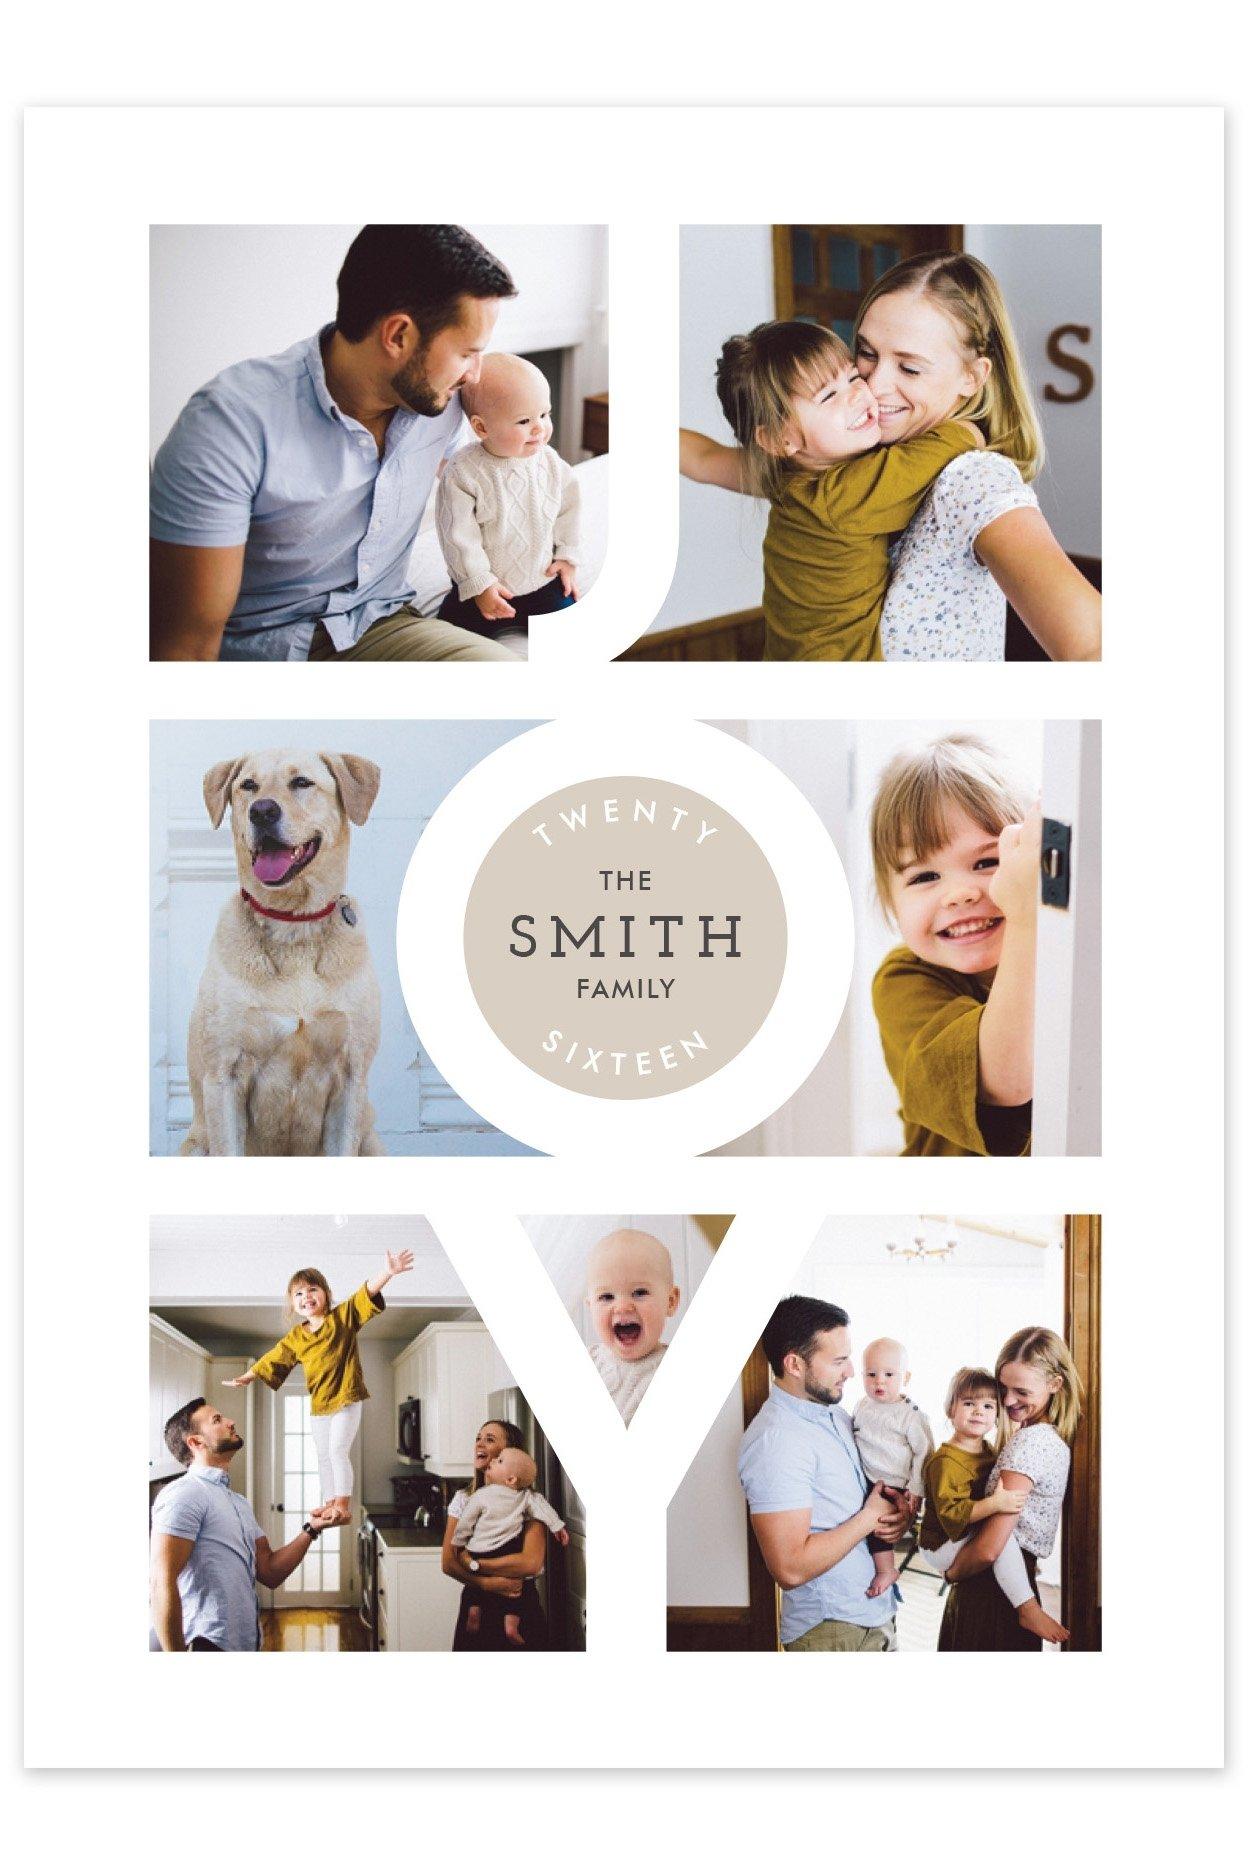 10 Unique Christmas Card Family Photo Ideas family photo christmas card ideas merry christmas and happy new 1 2020